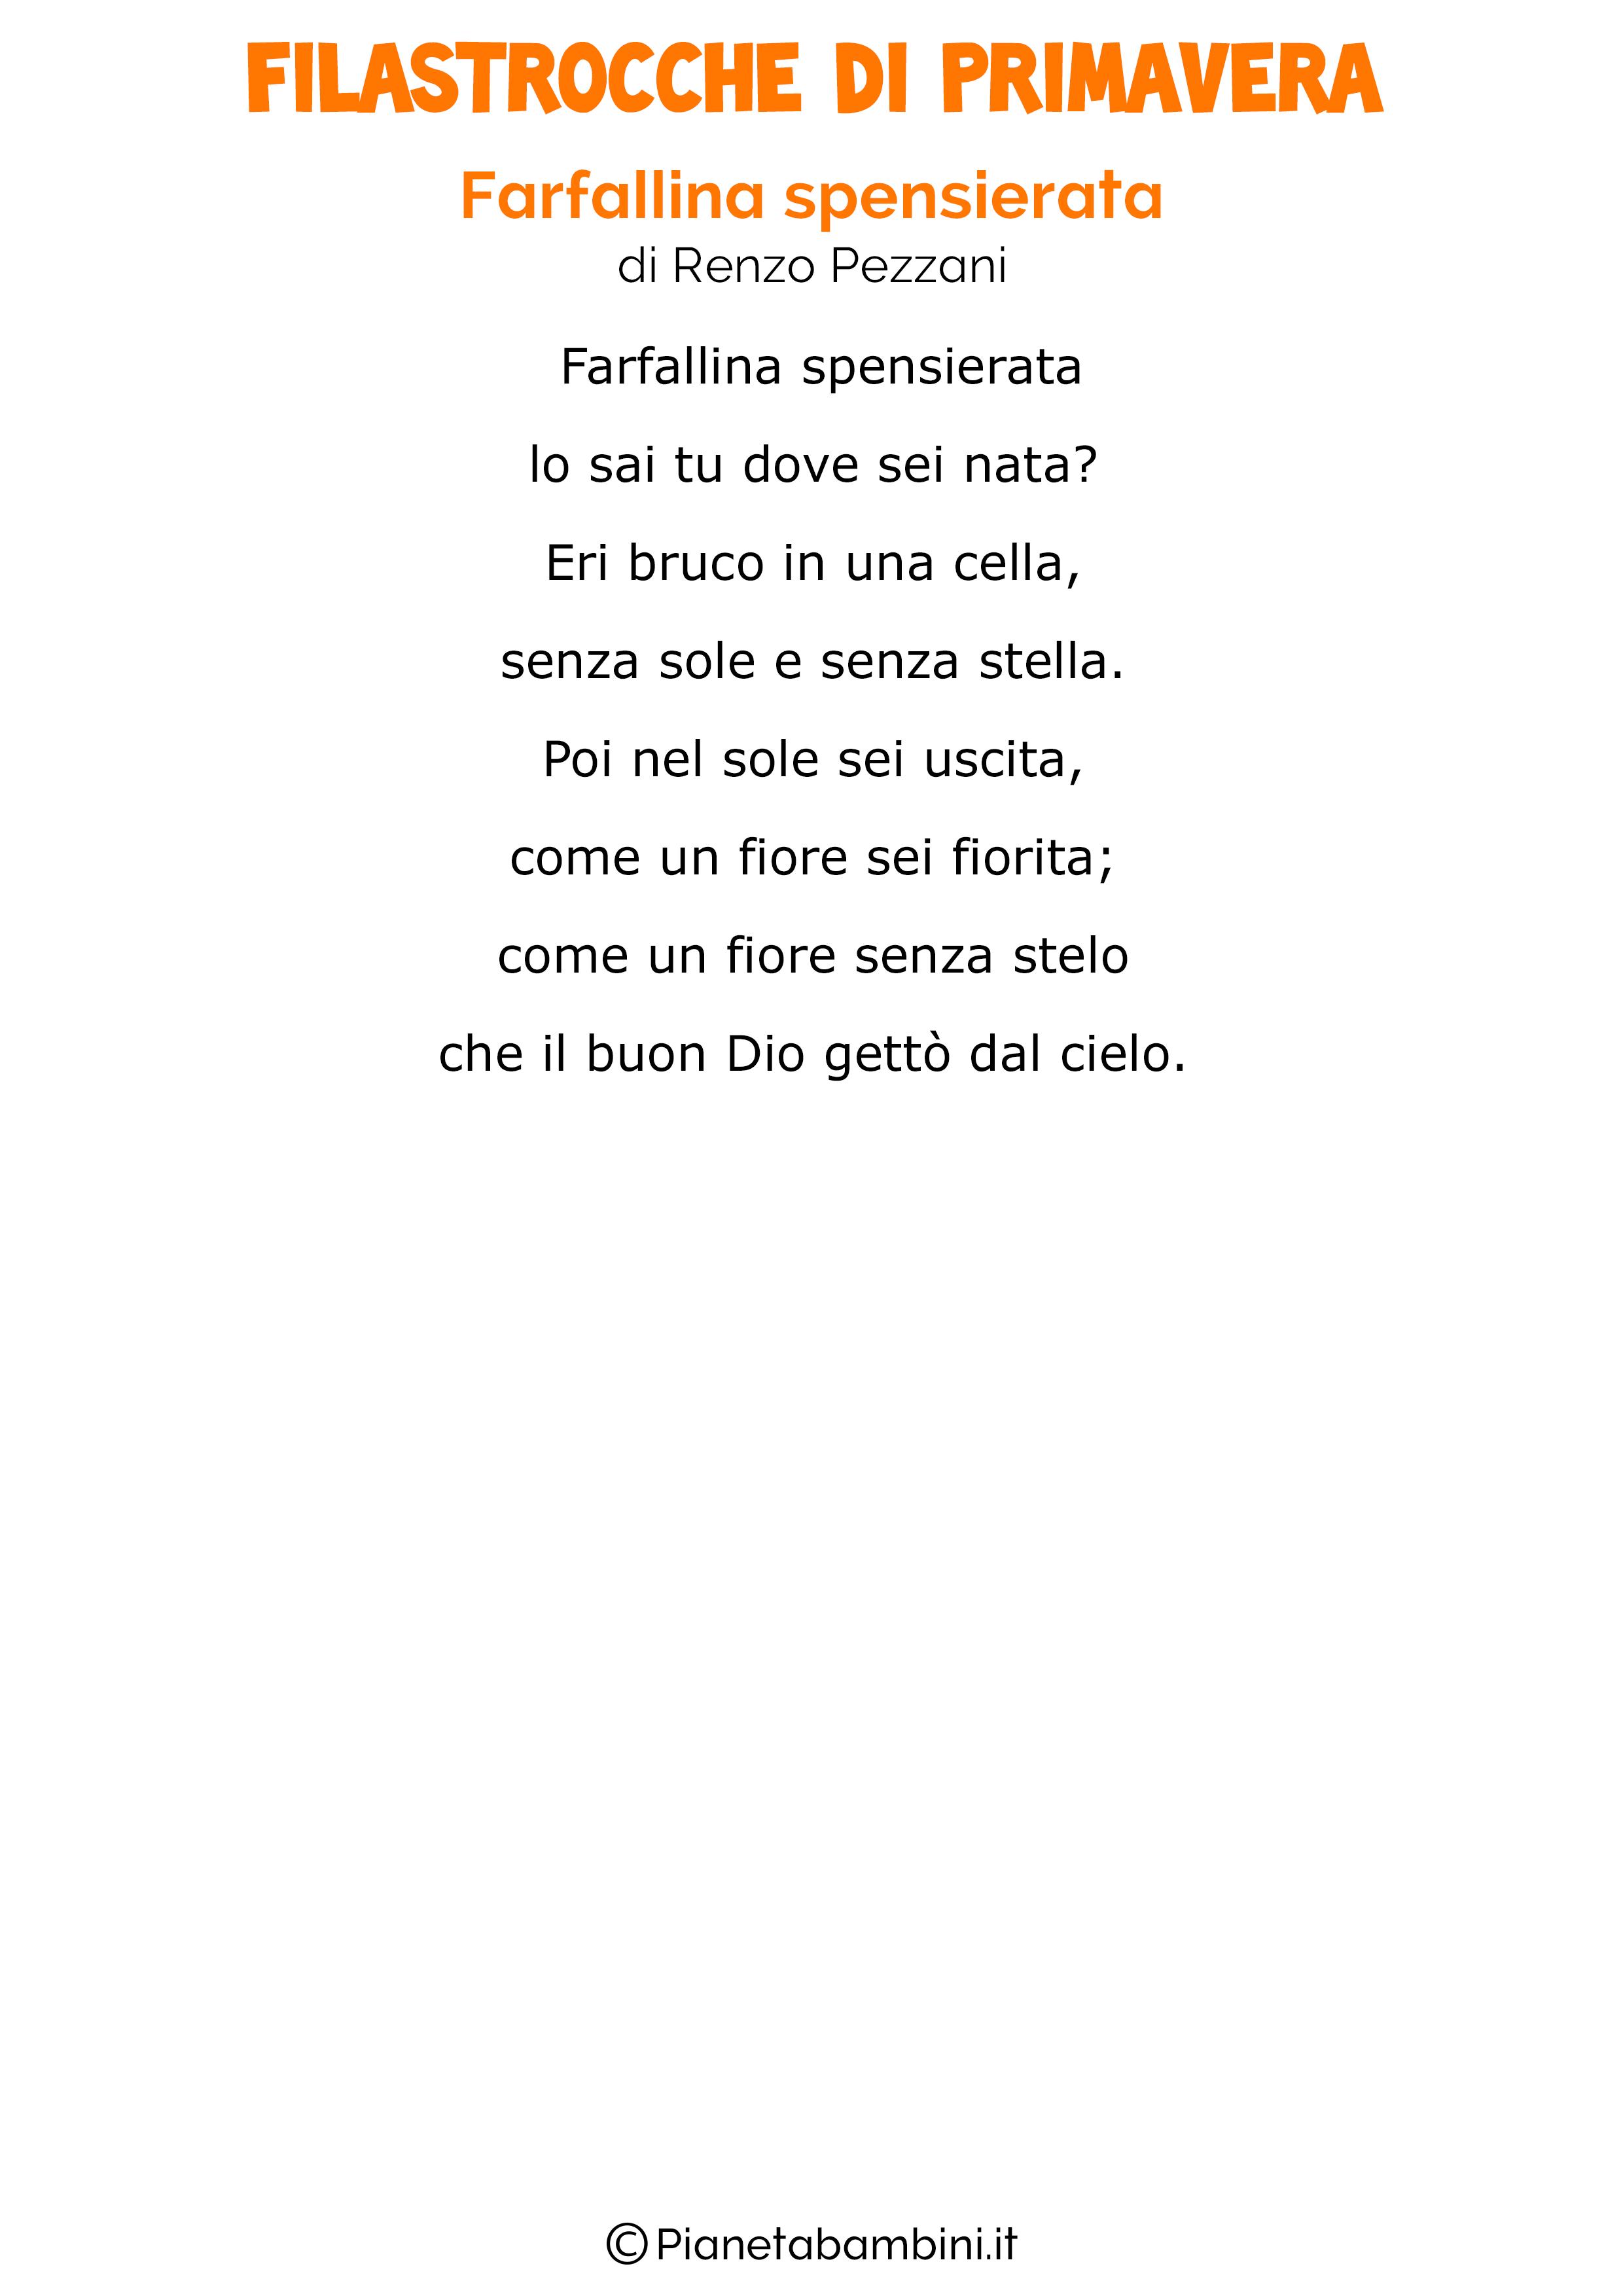 Farfallina-Spensierata-Renzo-Pezzani